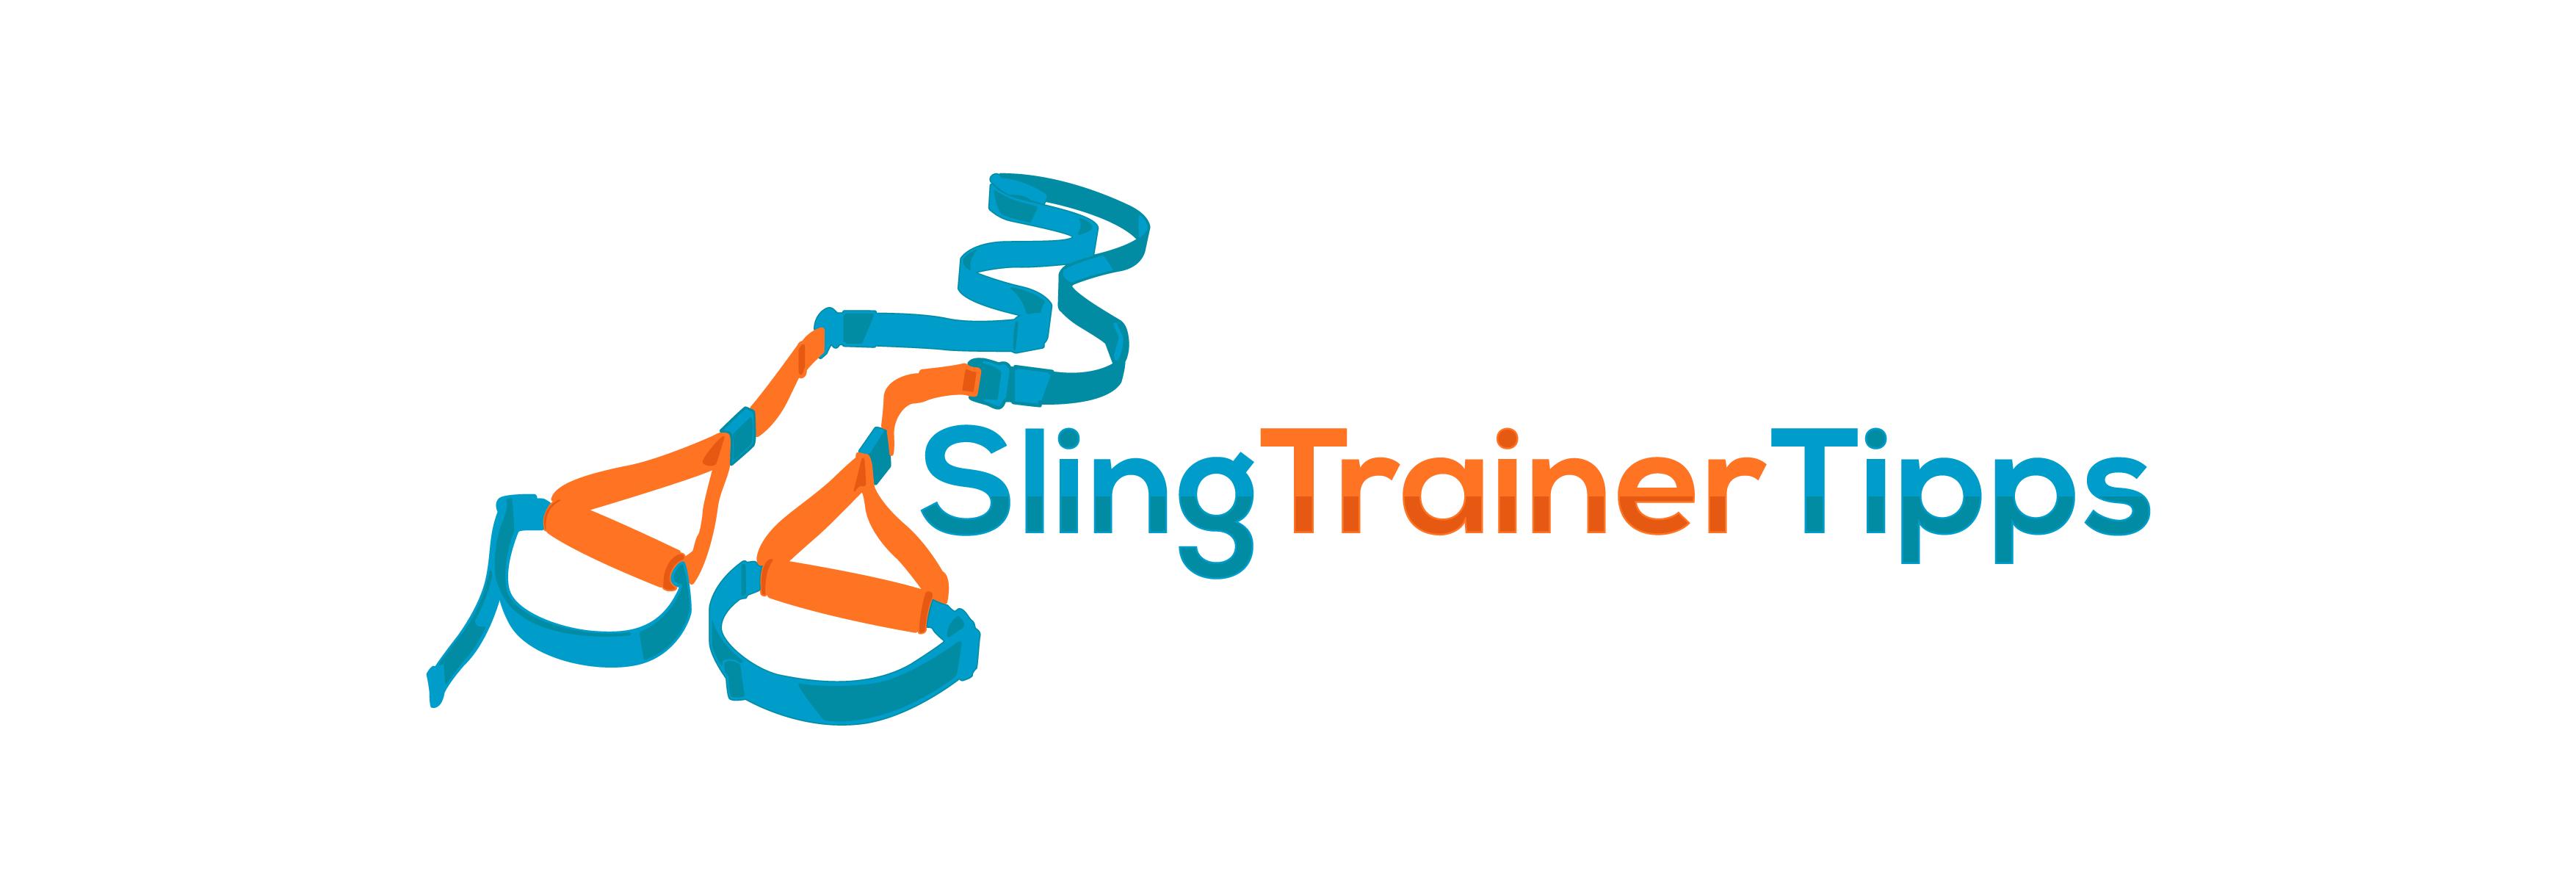 Alles zum Thema Sling-Trainer 1